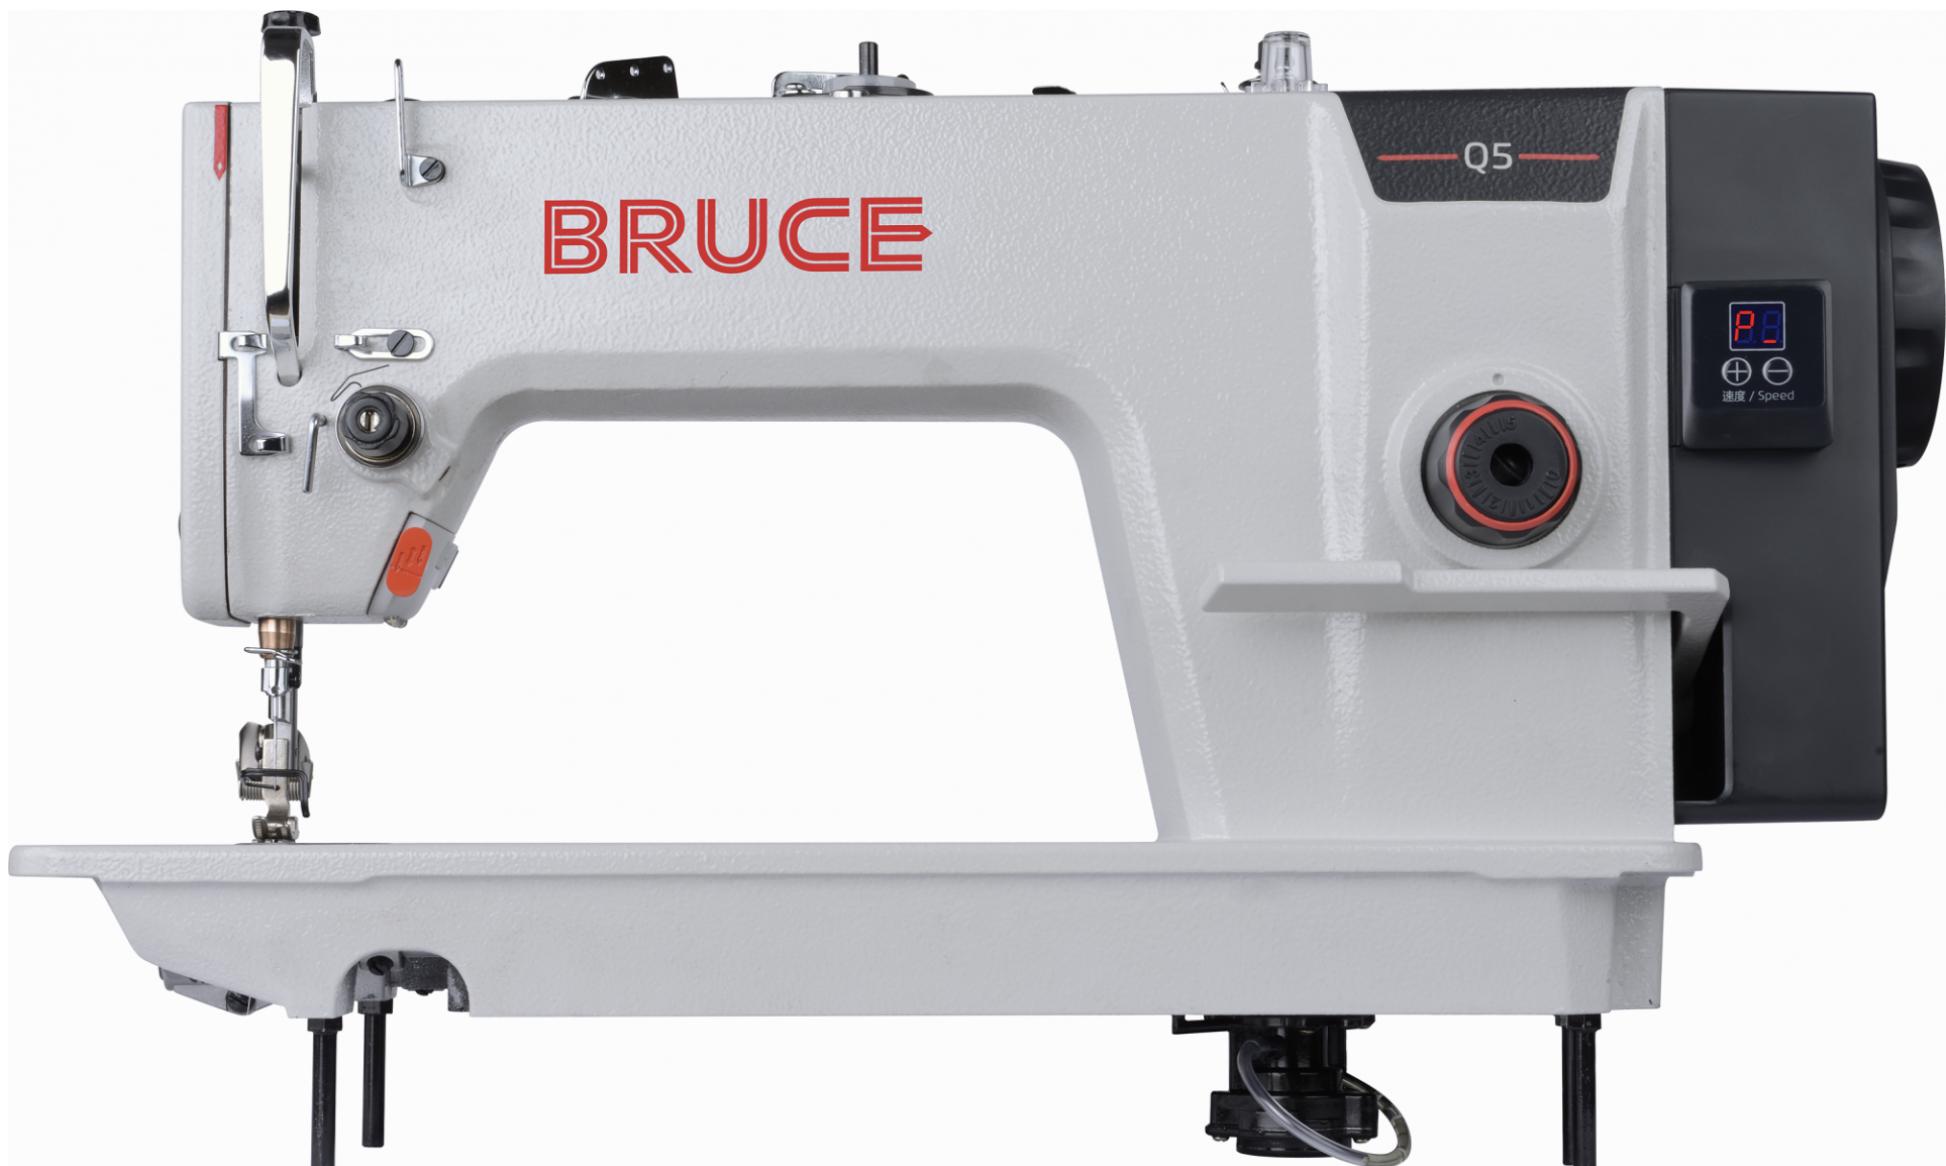 Bruce Q5 Direct Drive Lockstitch